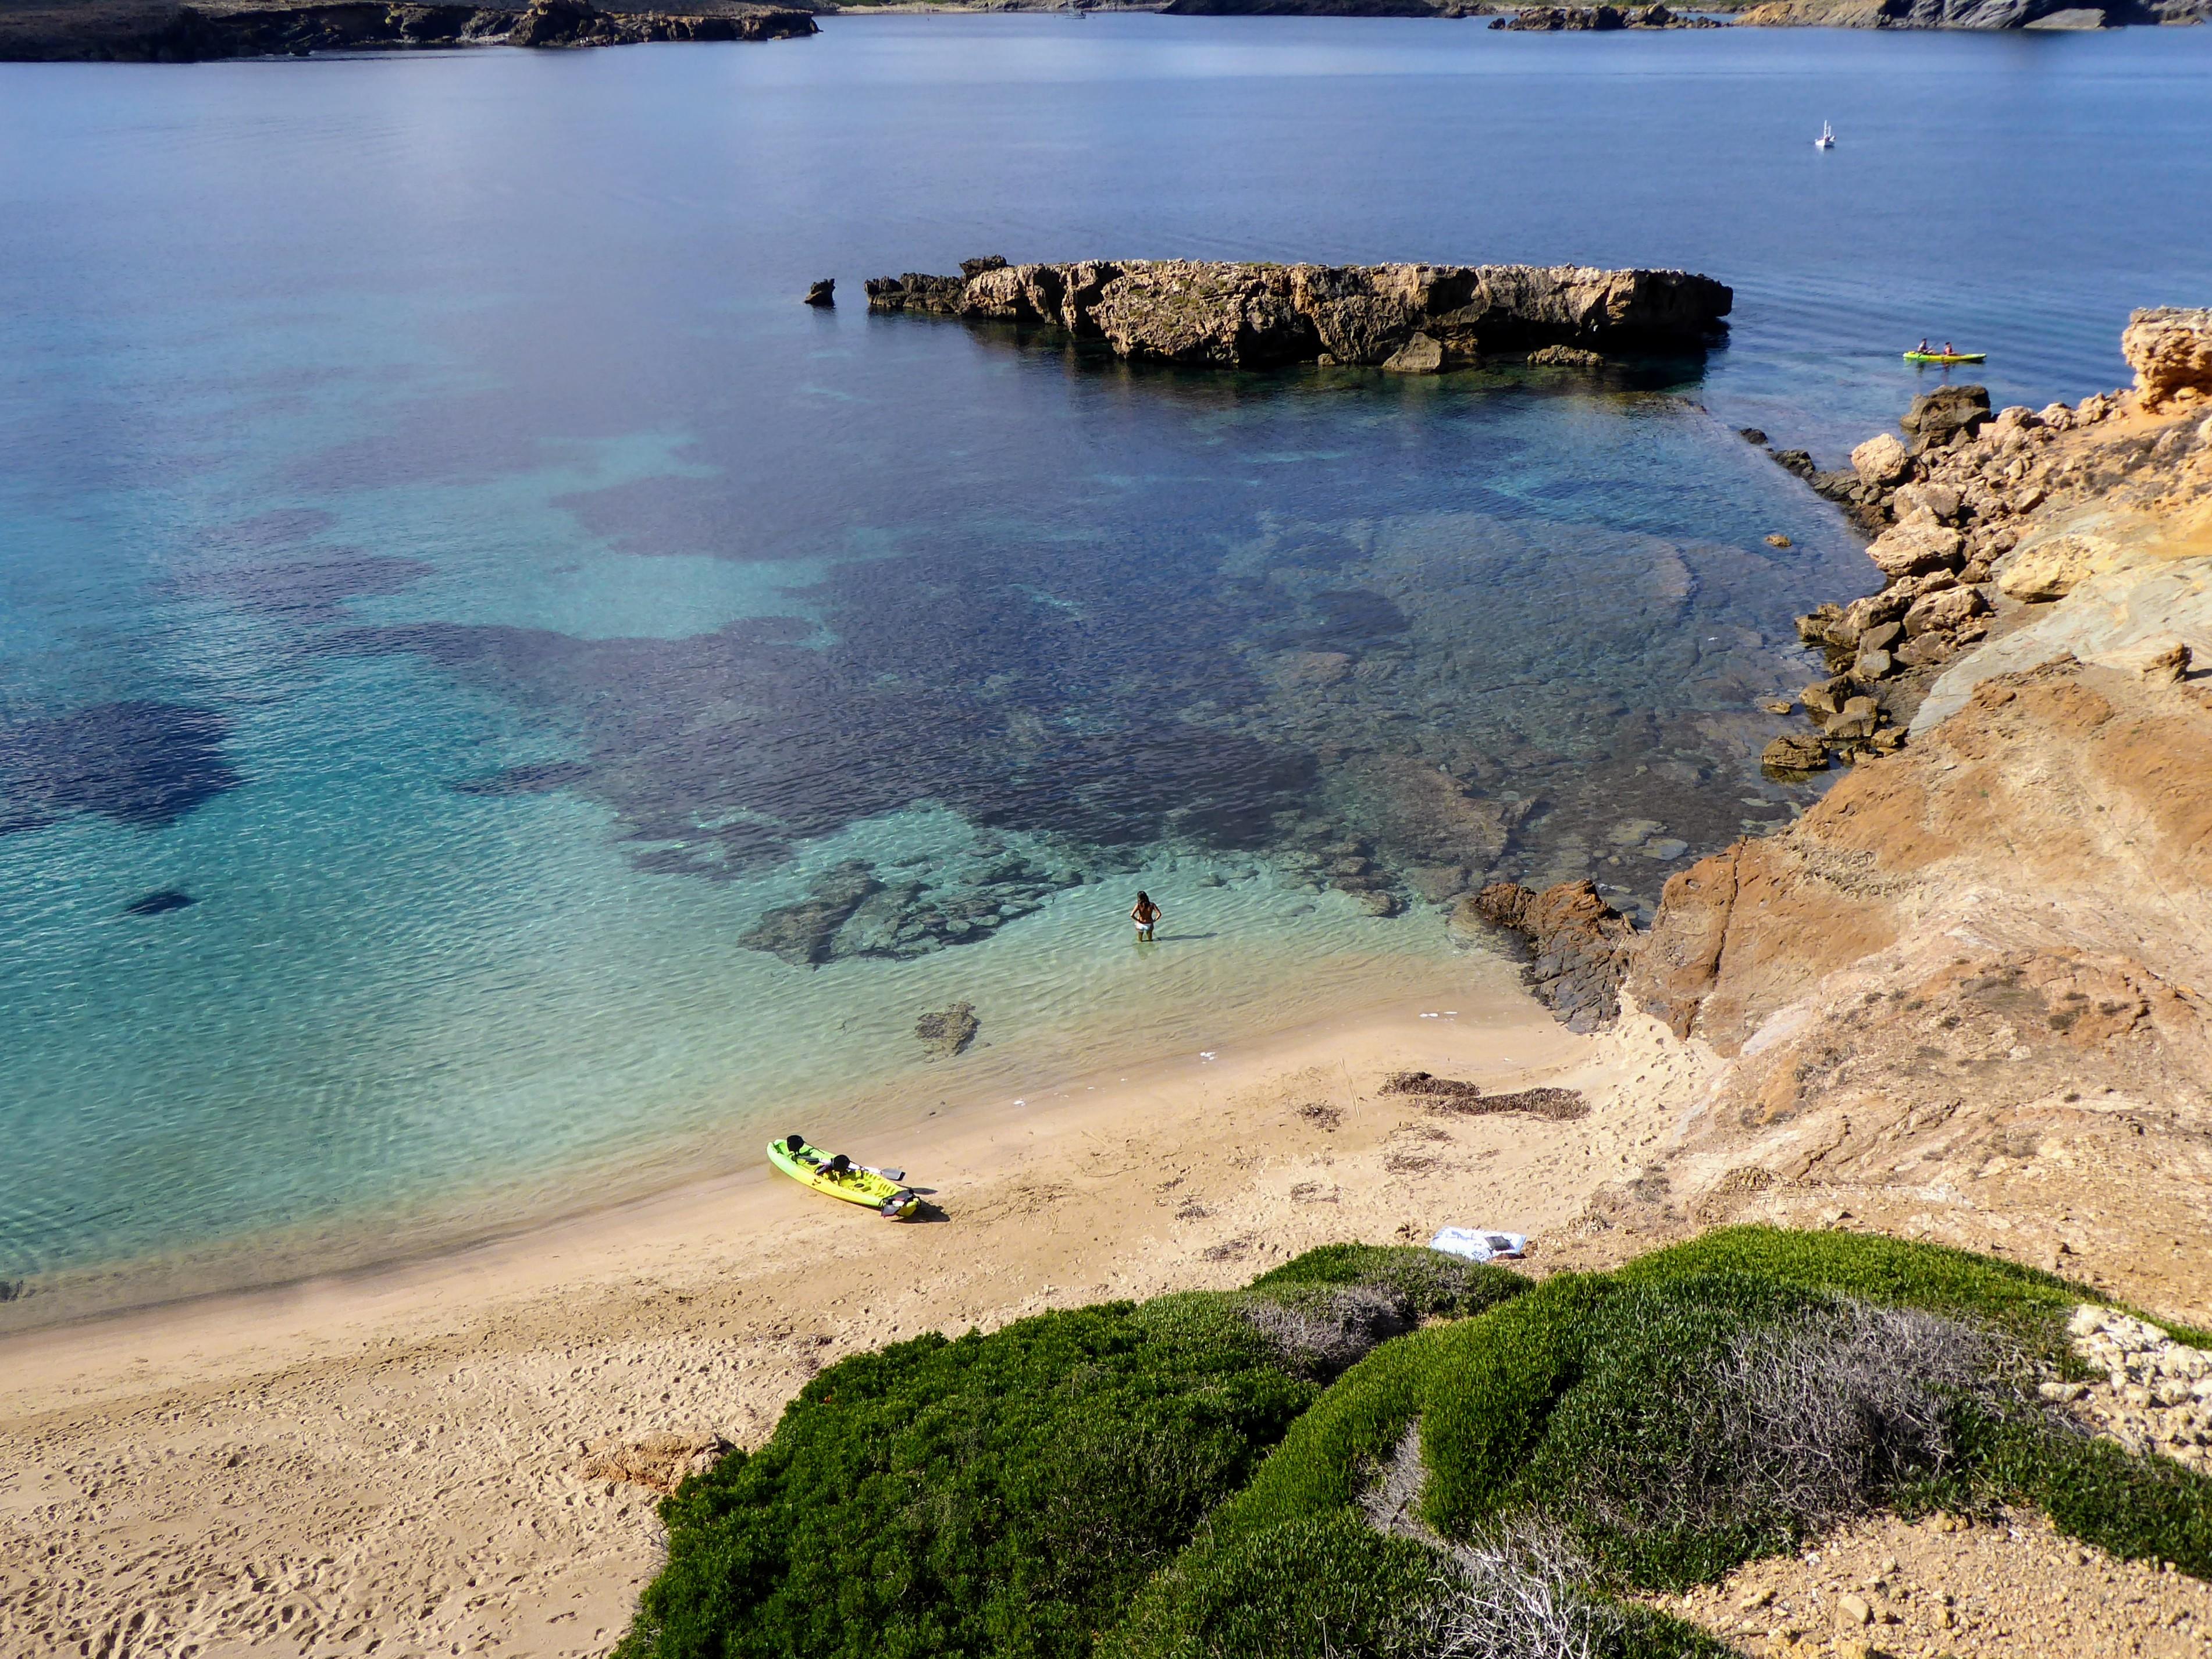 9f6400d88af0 9 Consejos Para Preparar tu Viaje a Menorca | Menorca Diferente